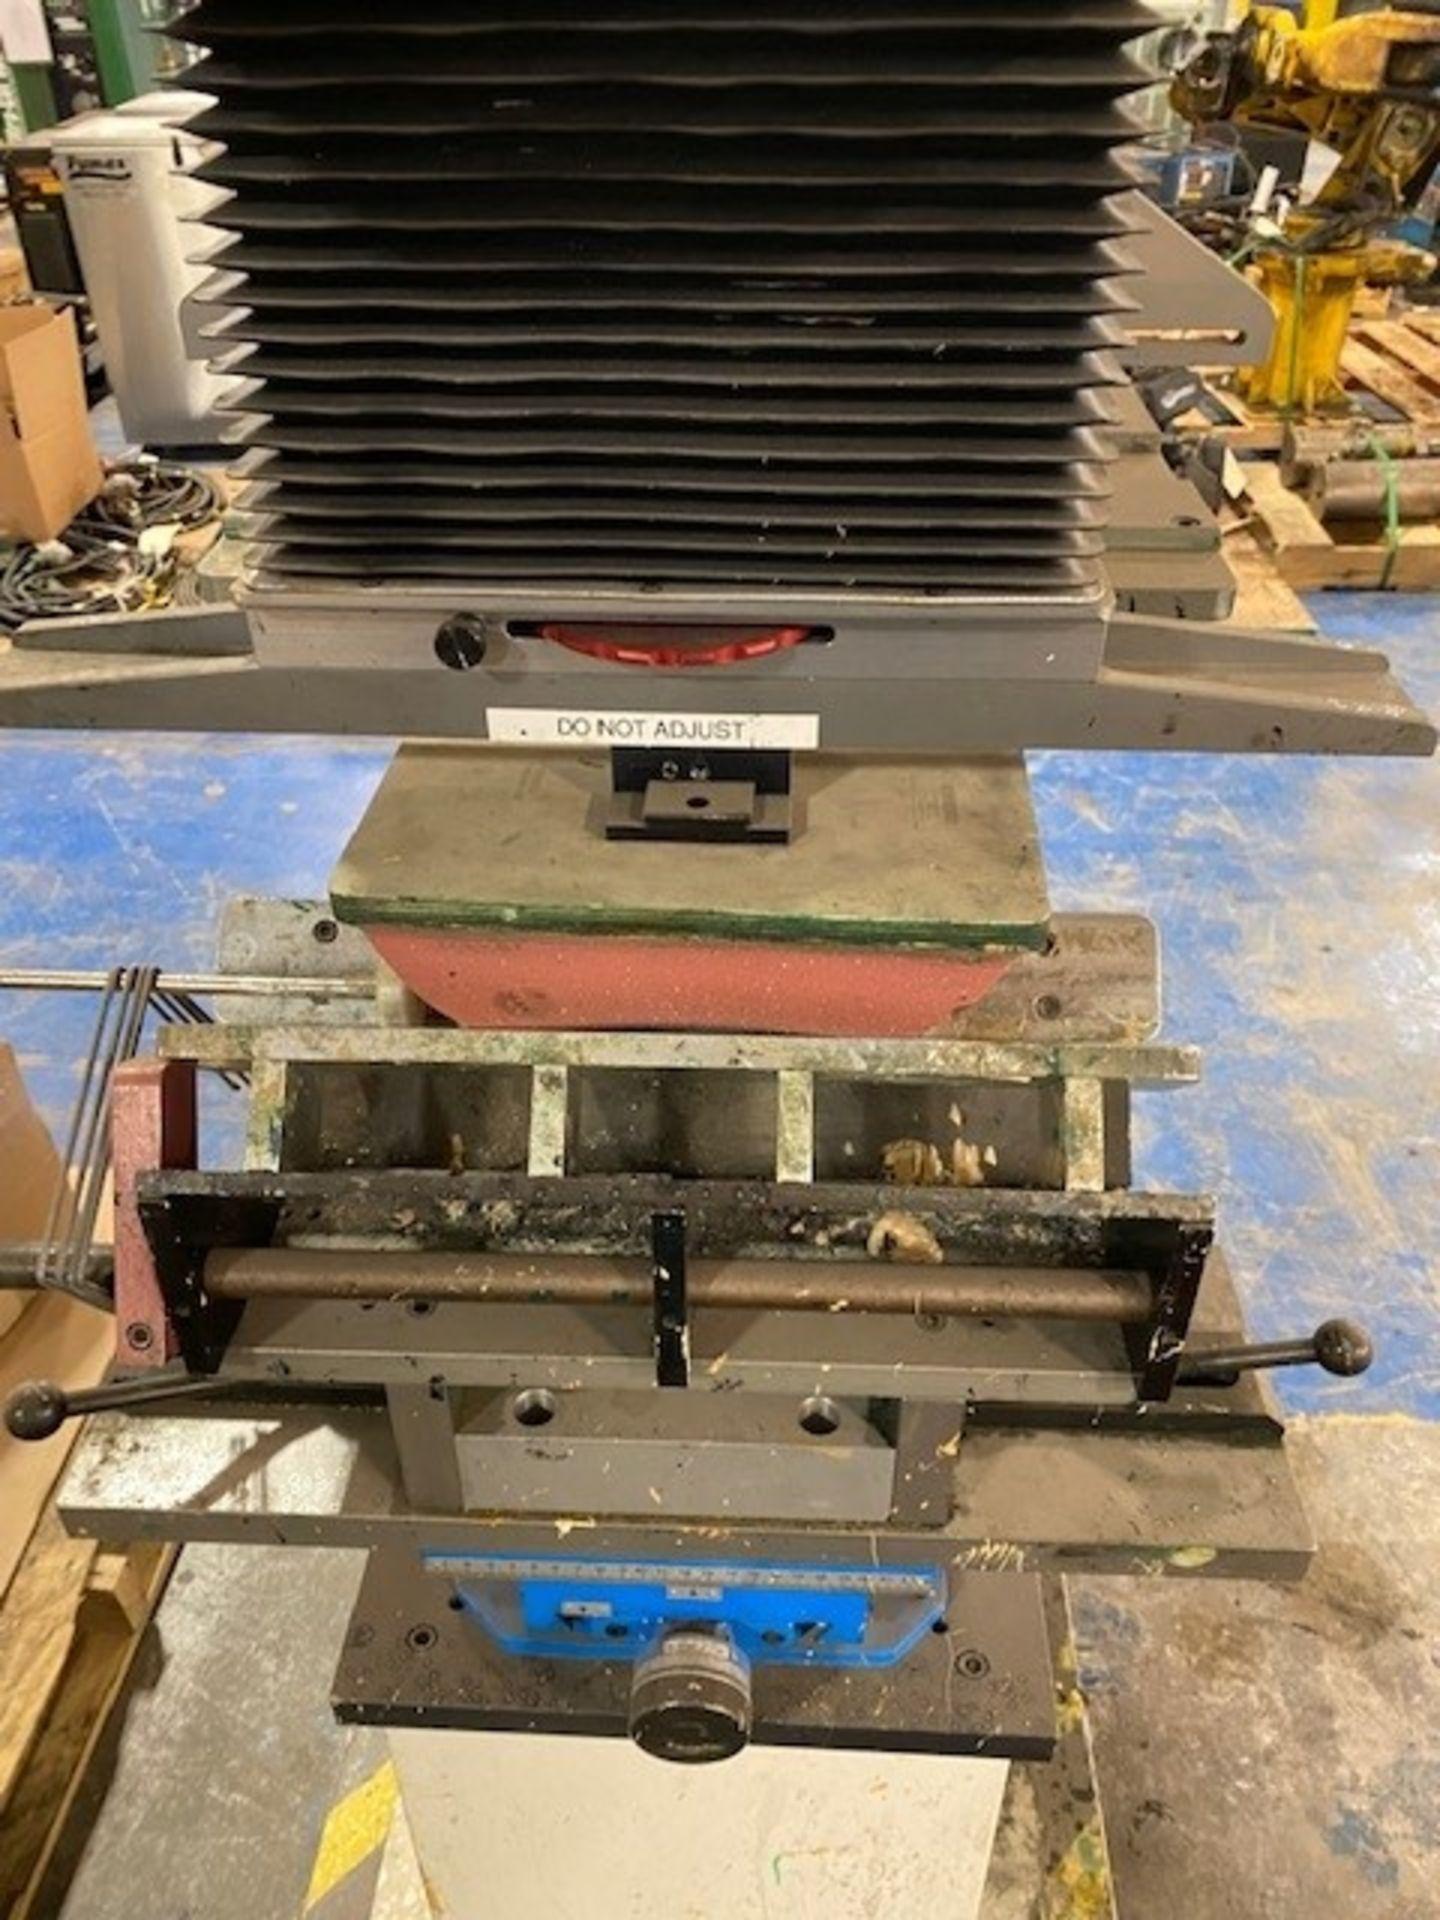 Printex G2-175 Multi-Function Modular Pad Printing Machine - Image 4 of 7